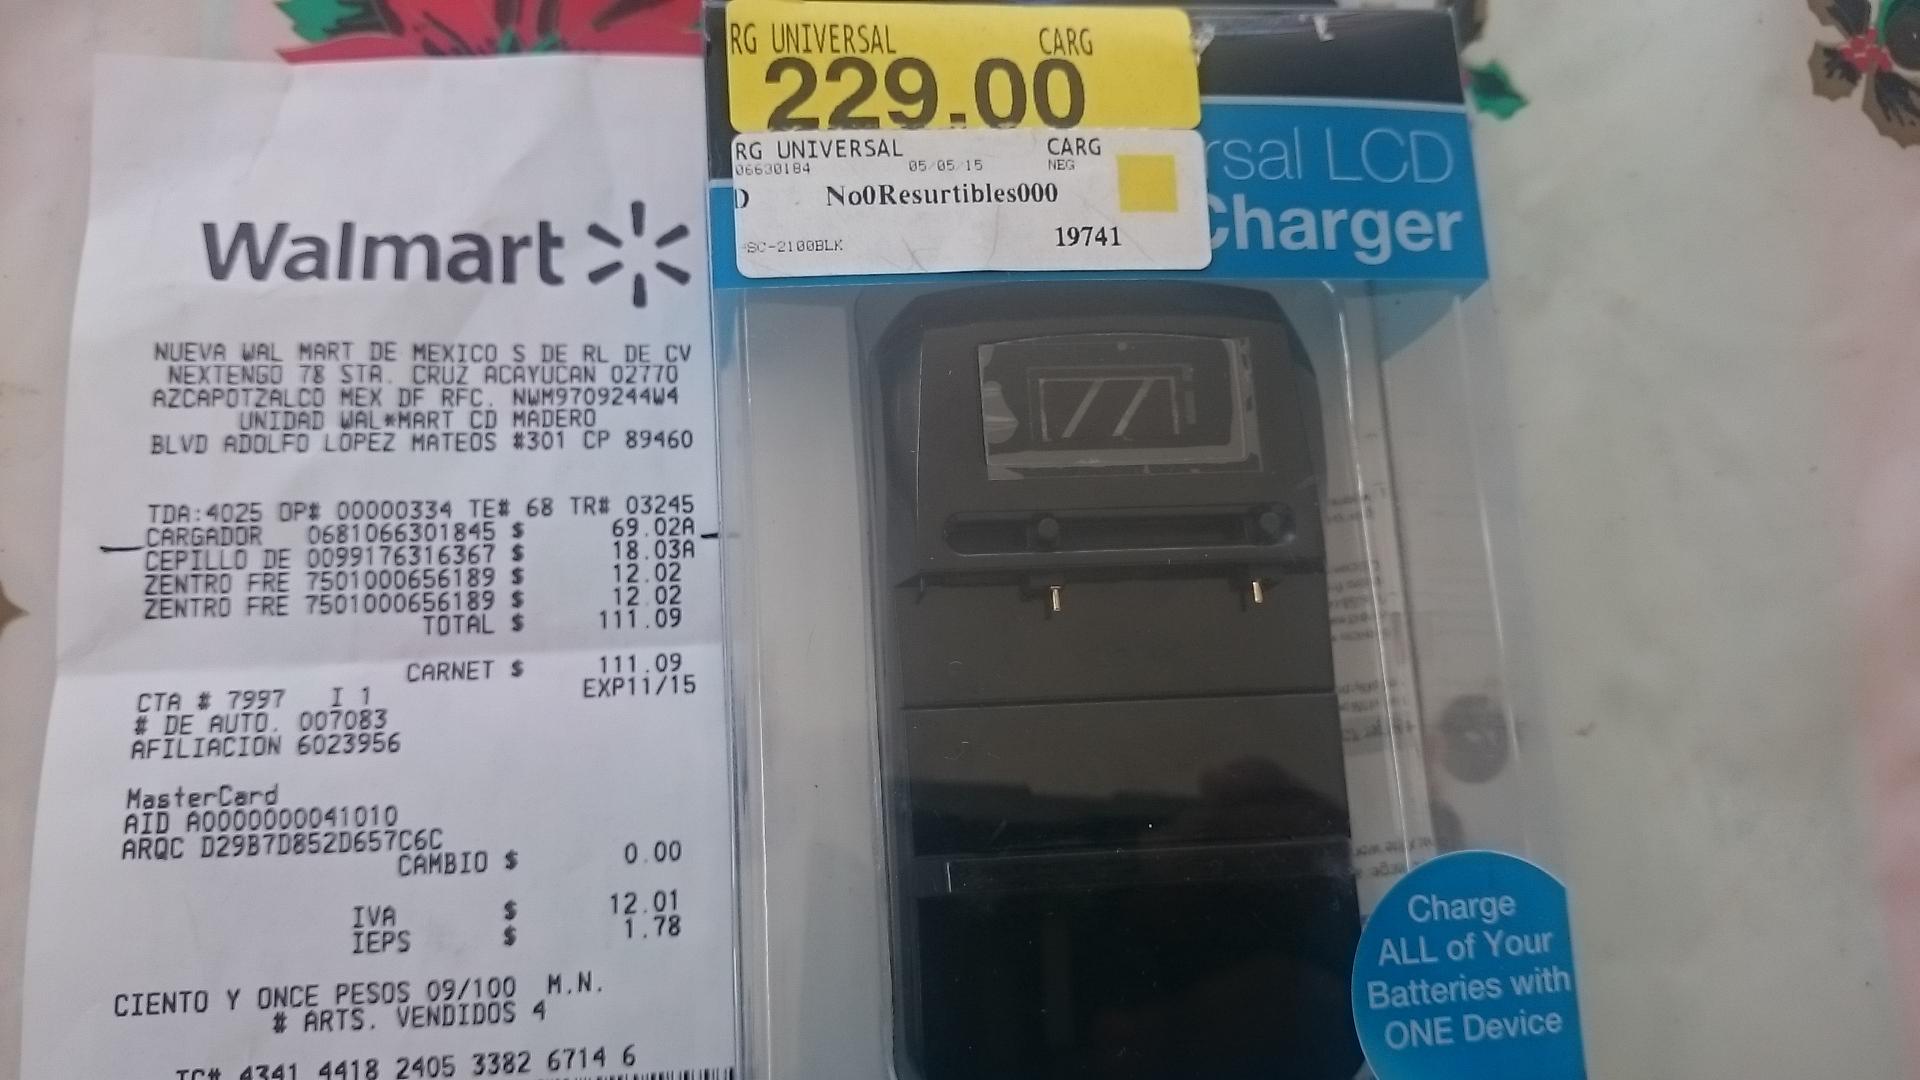 Walmart: cargador universal $69.02